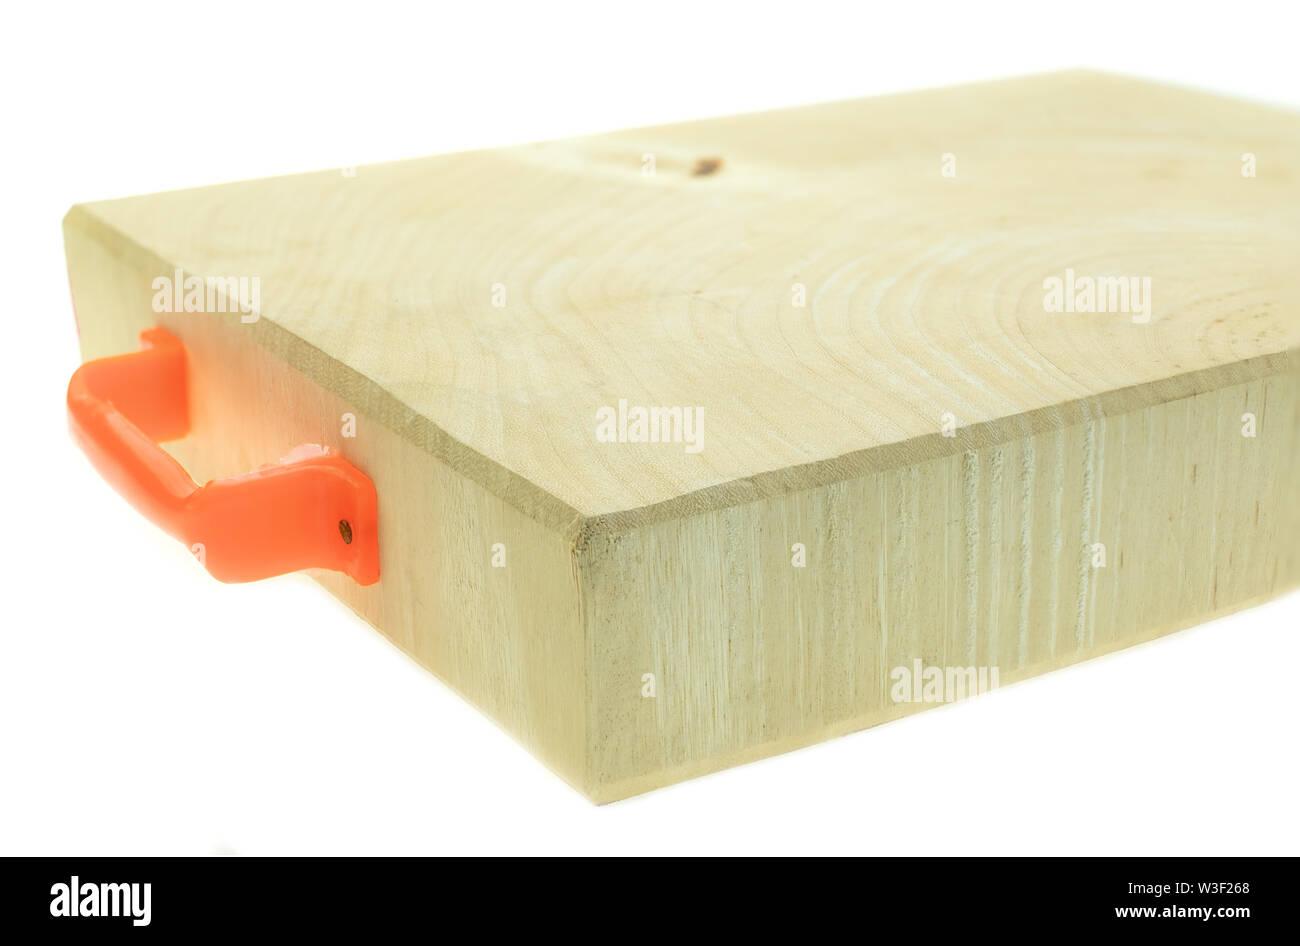 Tamarind wood butcher block countertop on white background - Stock Image